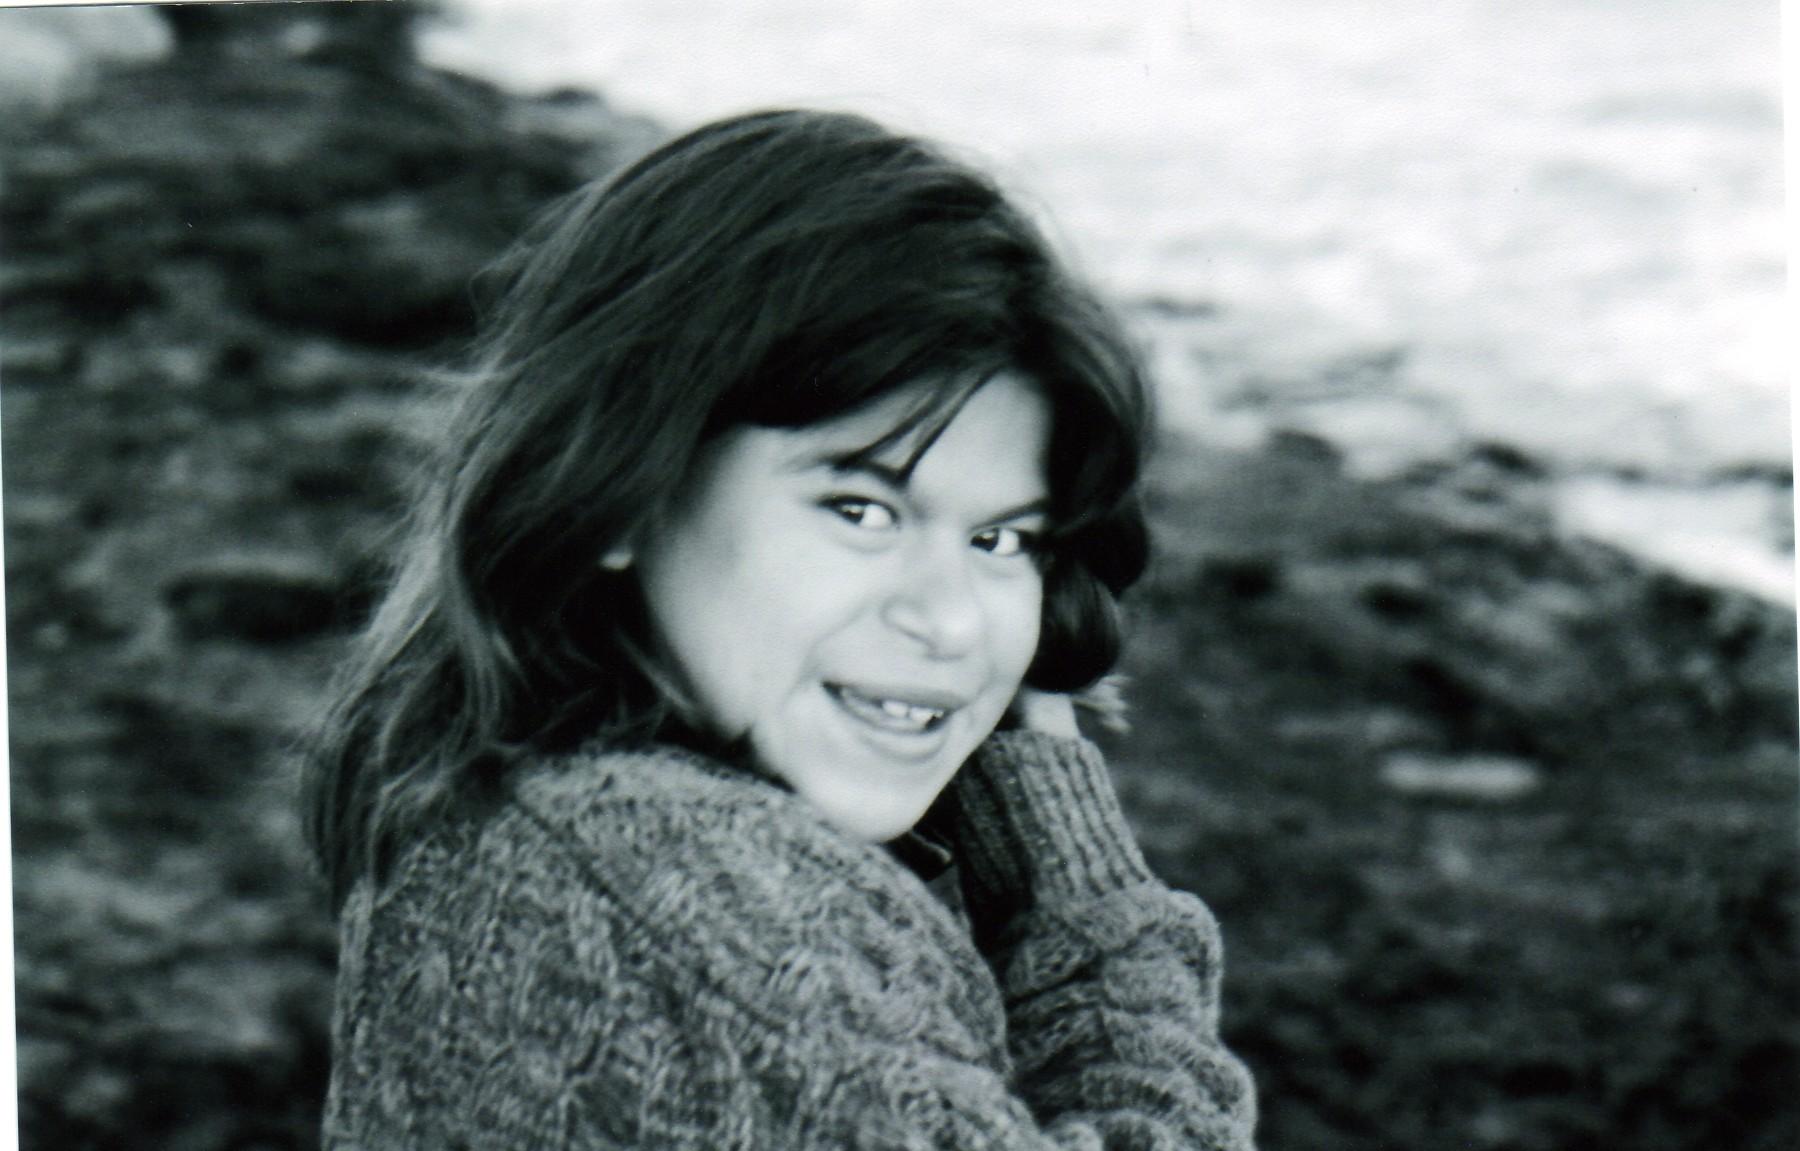 Sophia Hartman